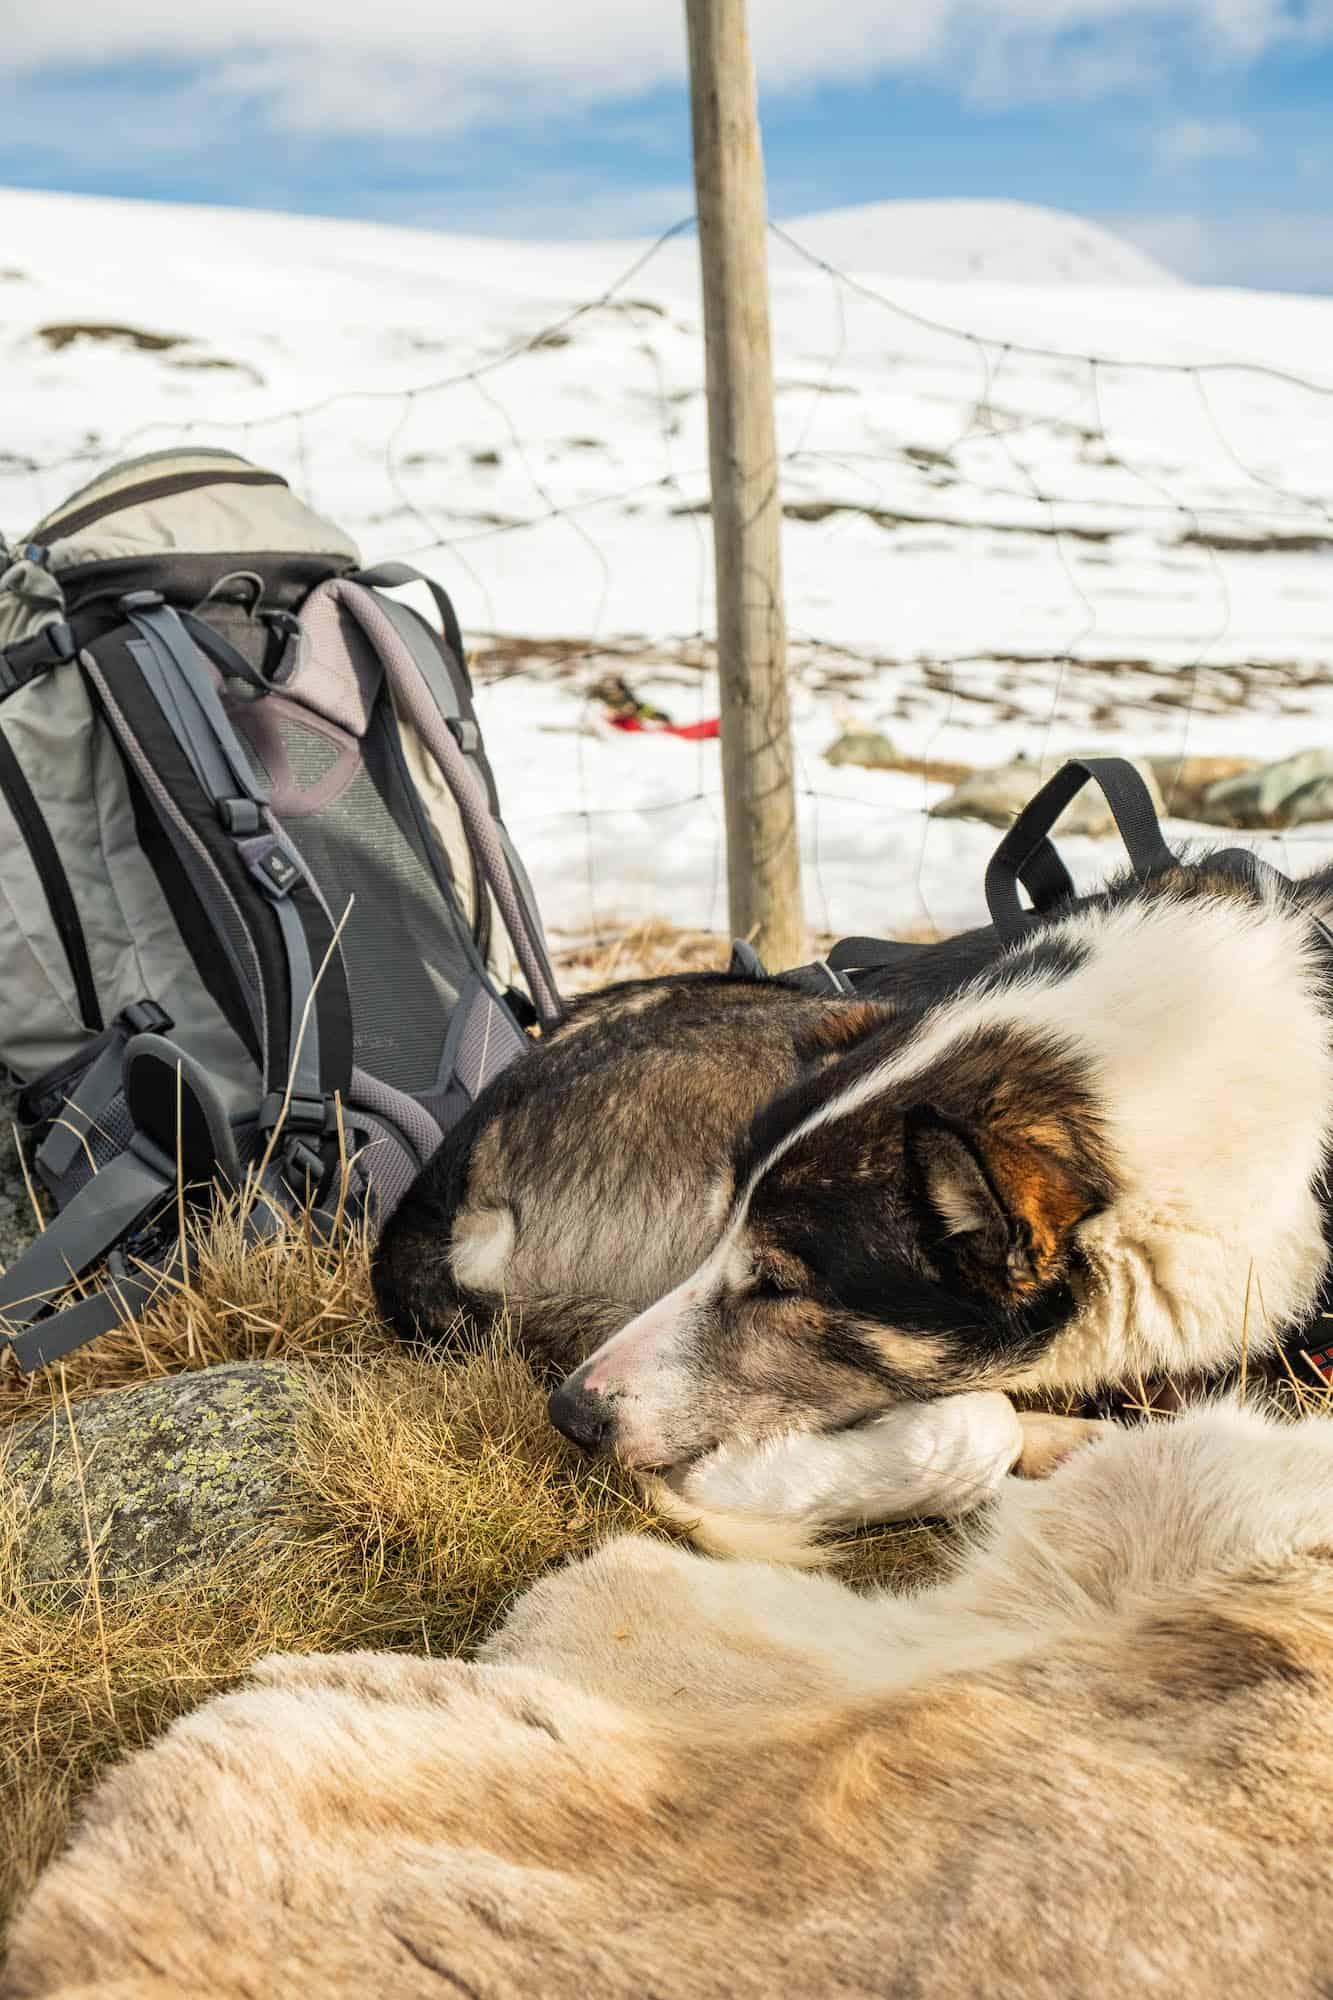 Sleeping Sled Dog — Winter in Norway